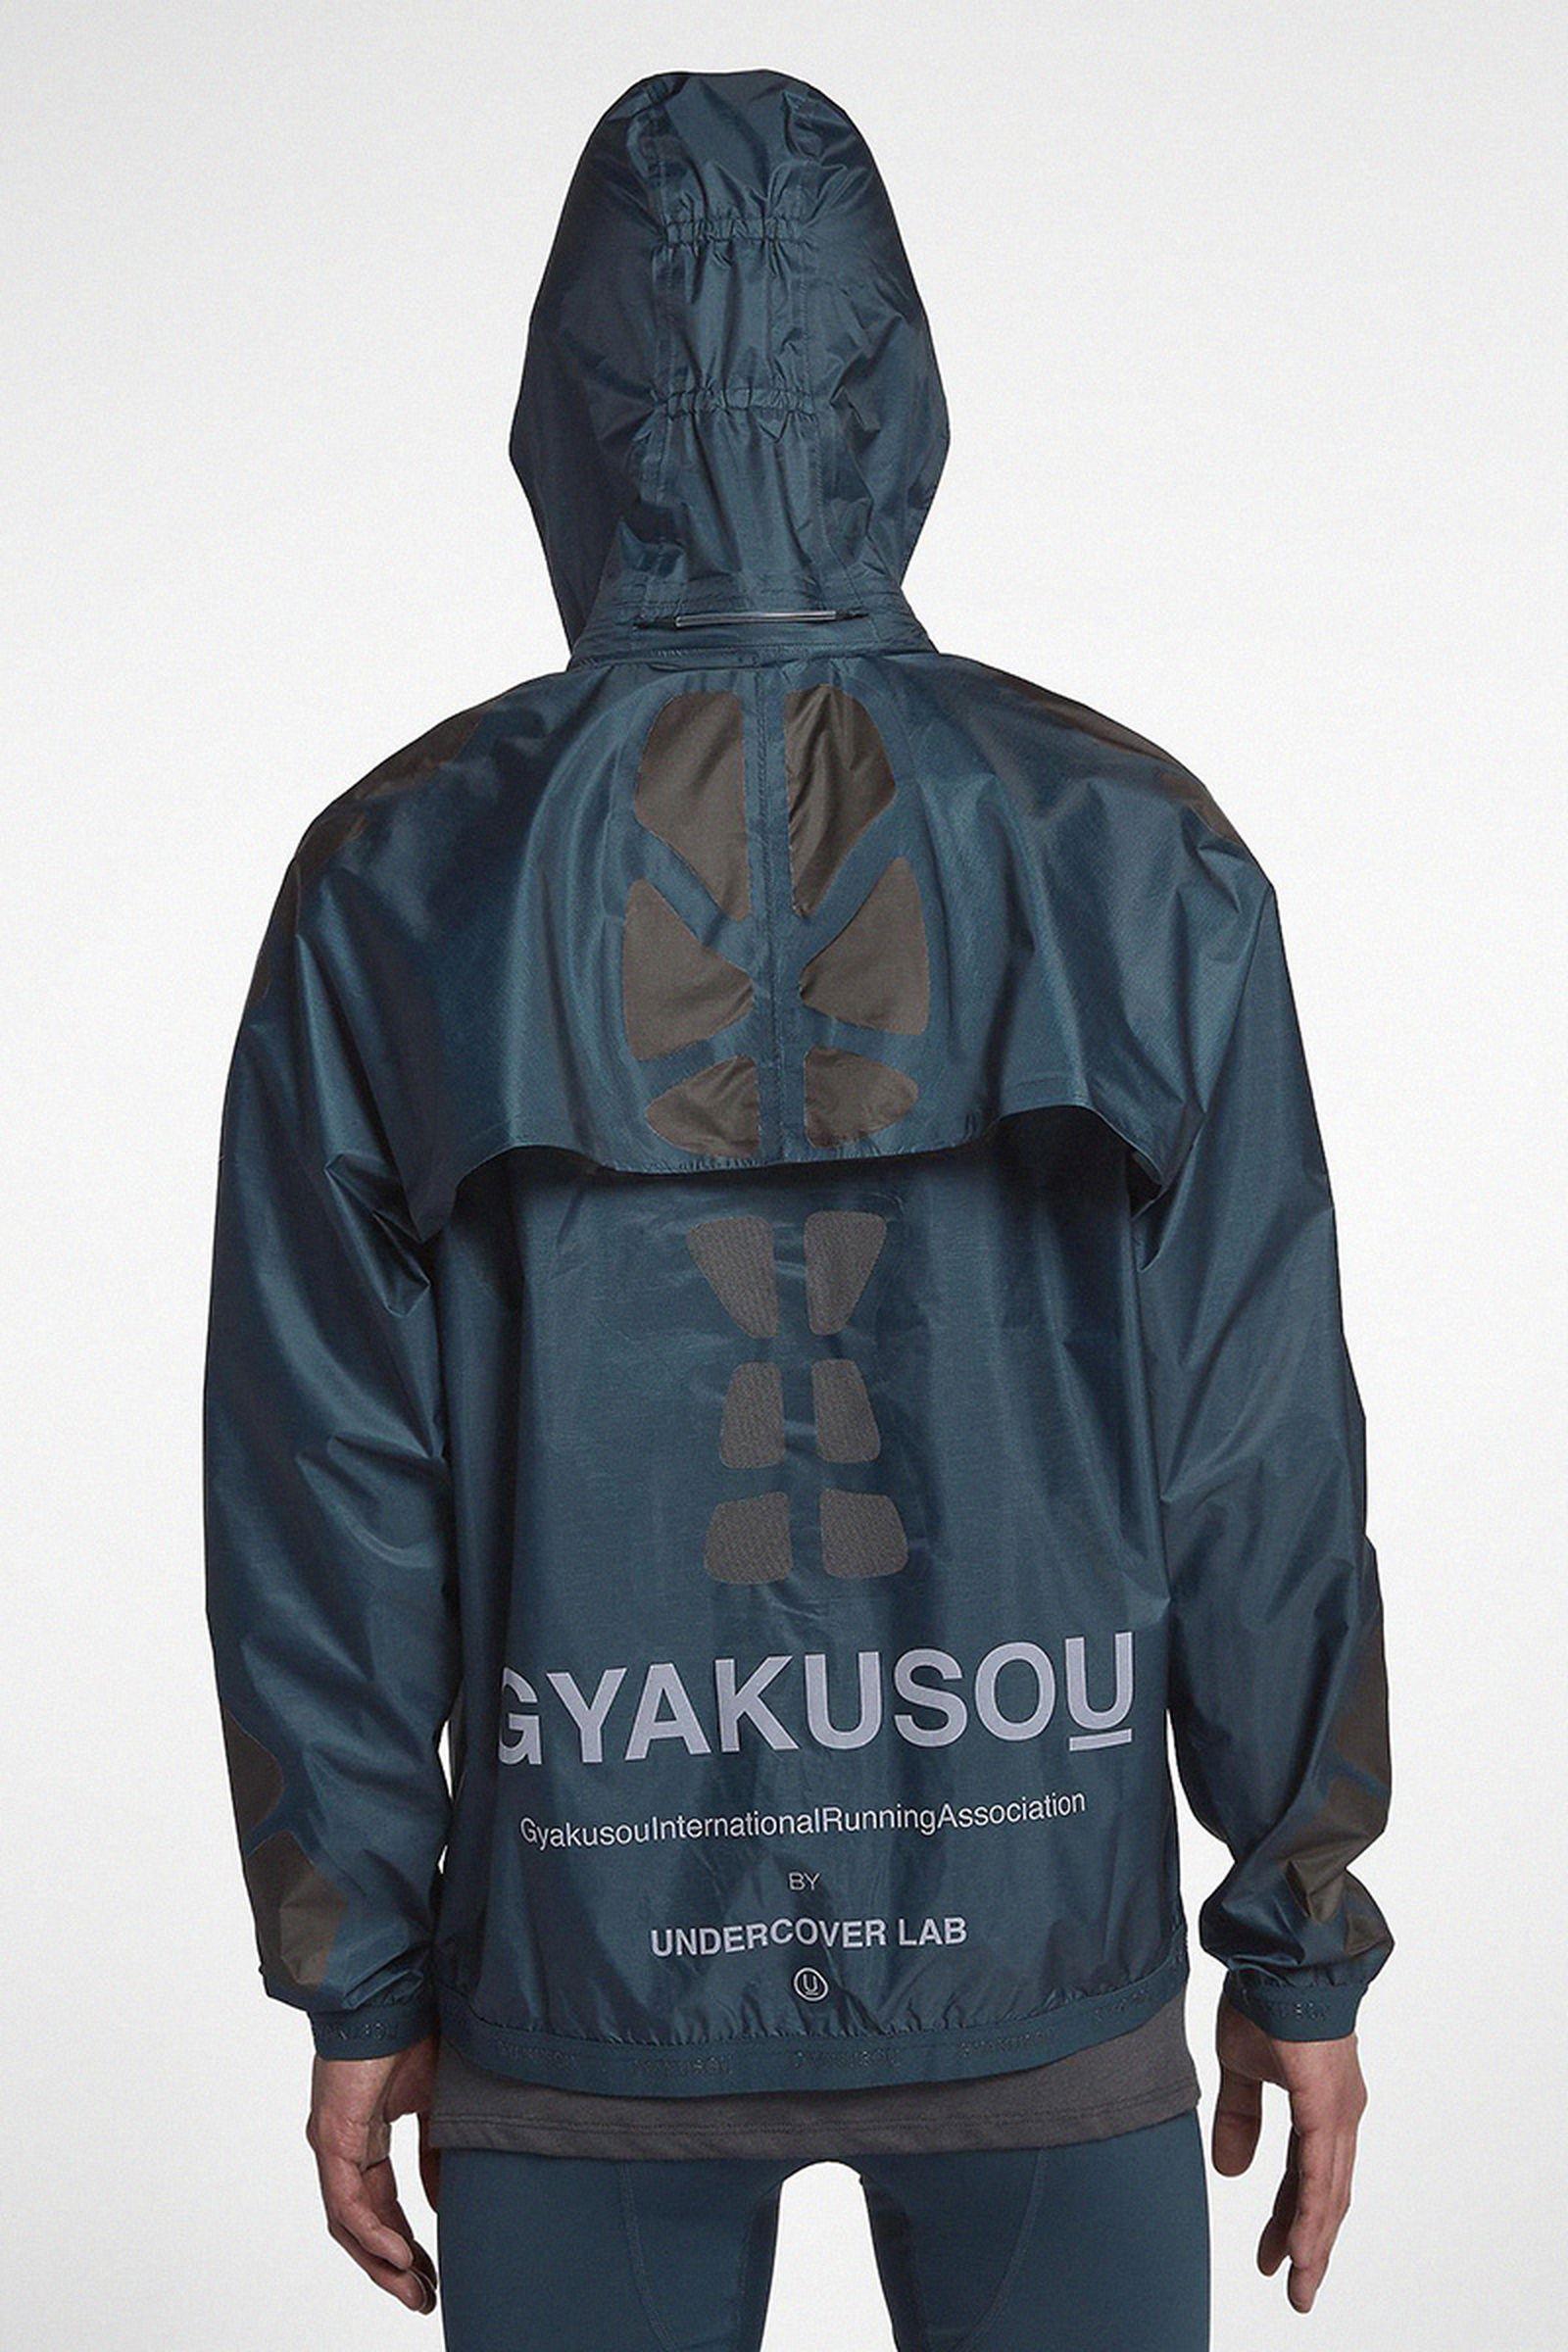 history jun takahashi nikes gyakusou nikelab undercover